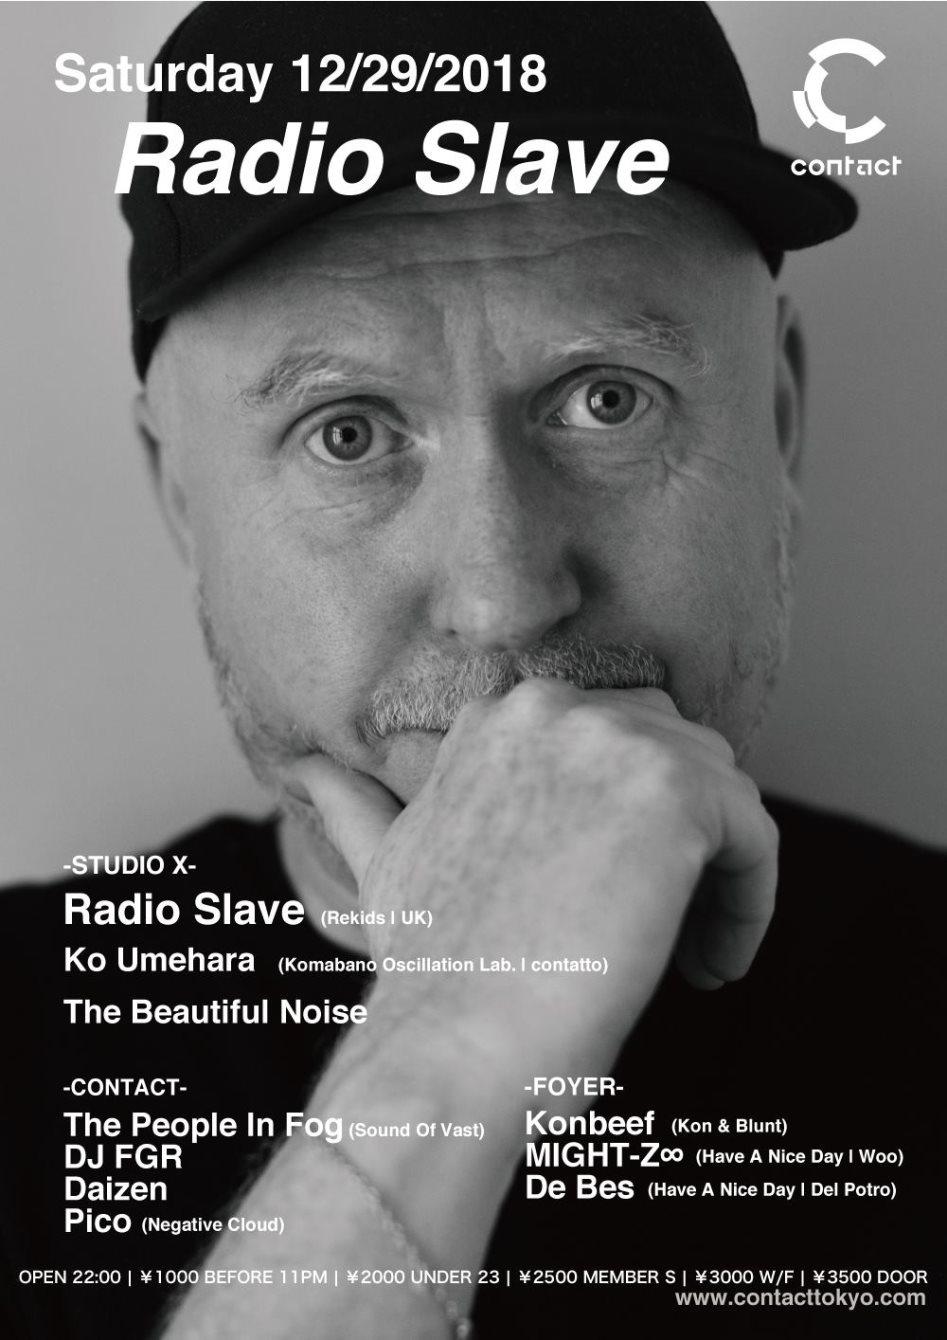 Radio Slave - Flyer front